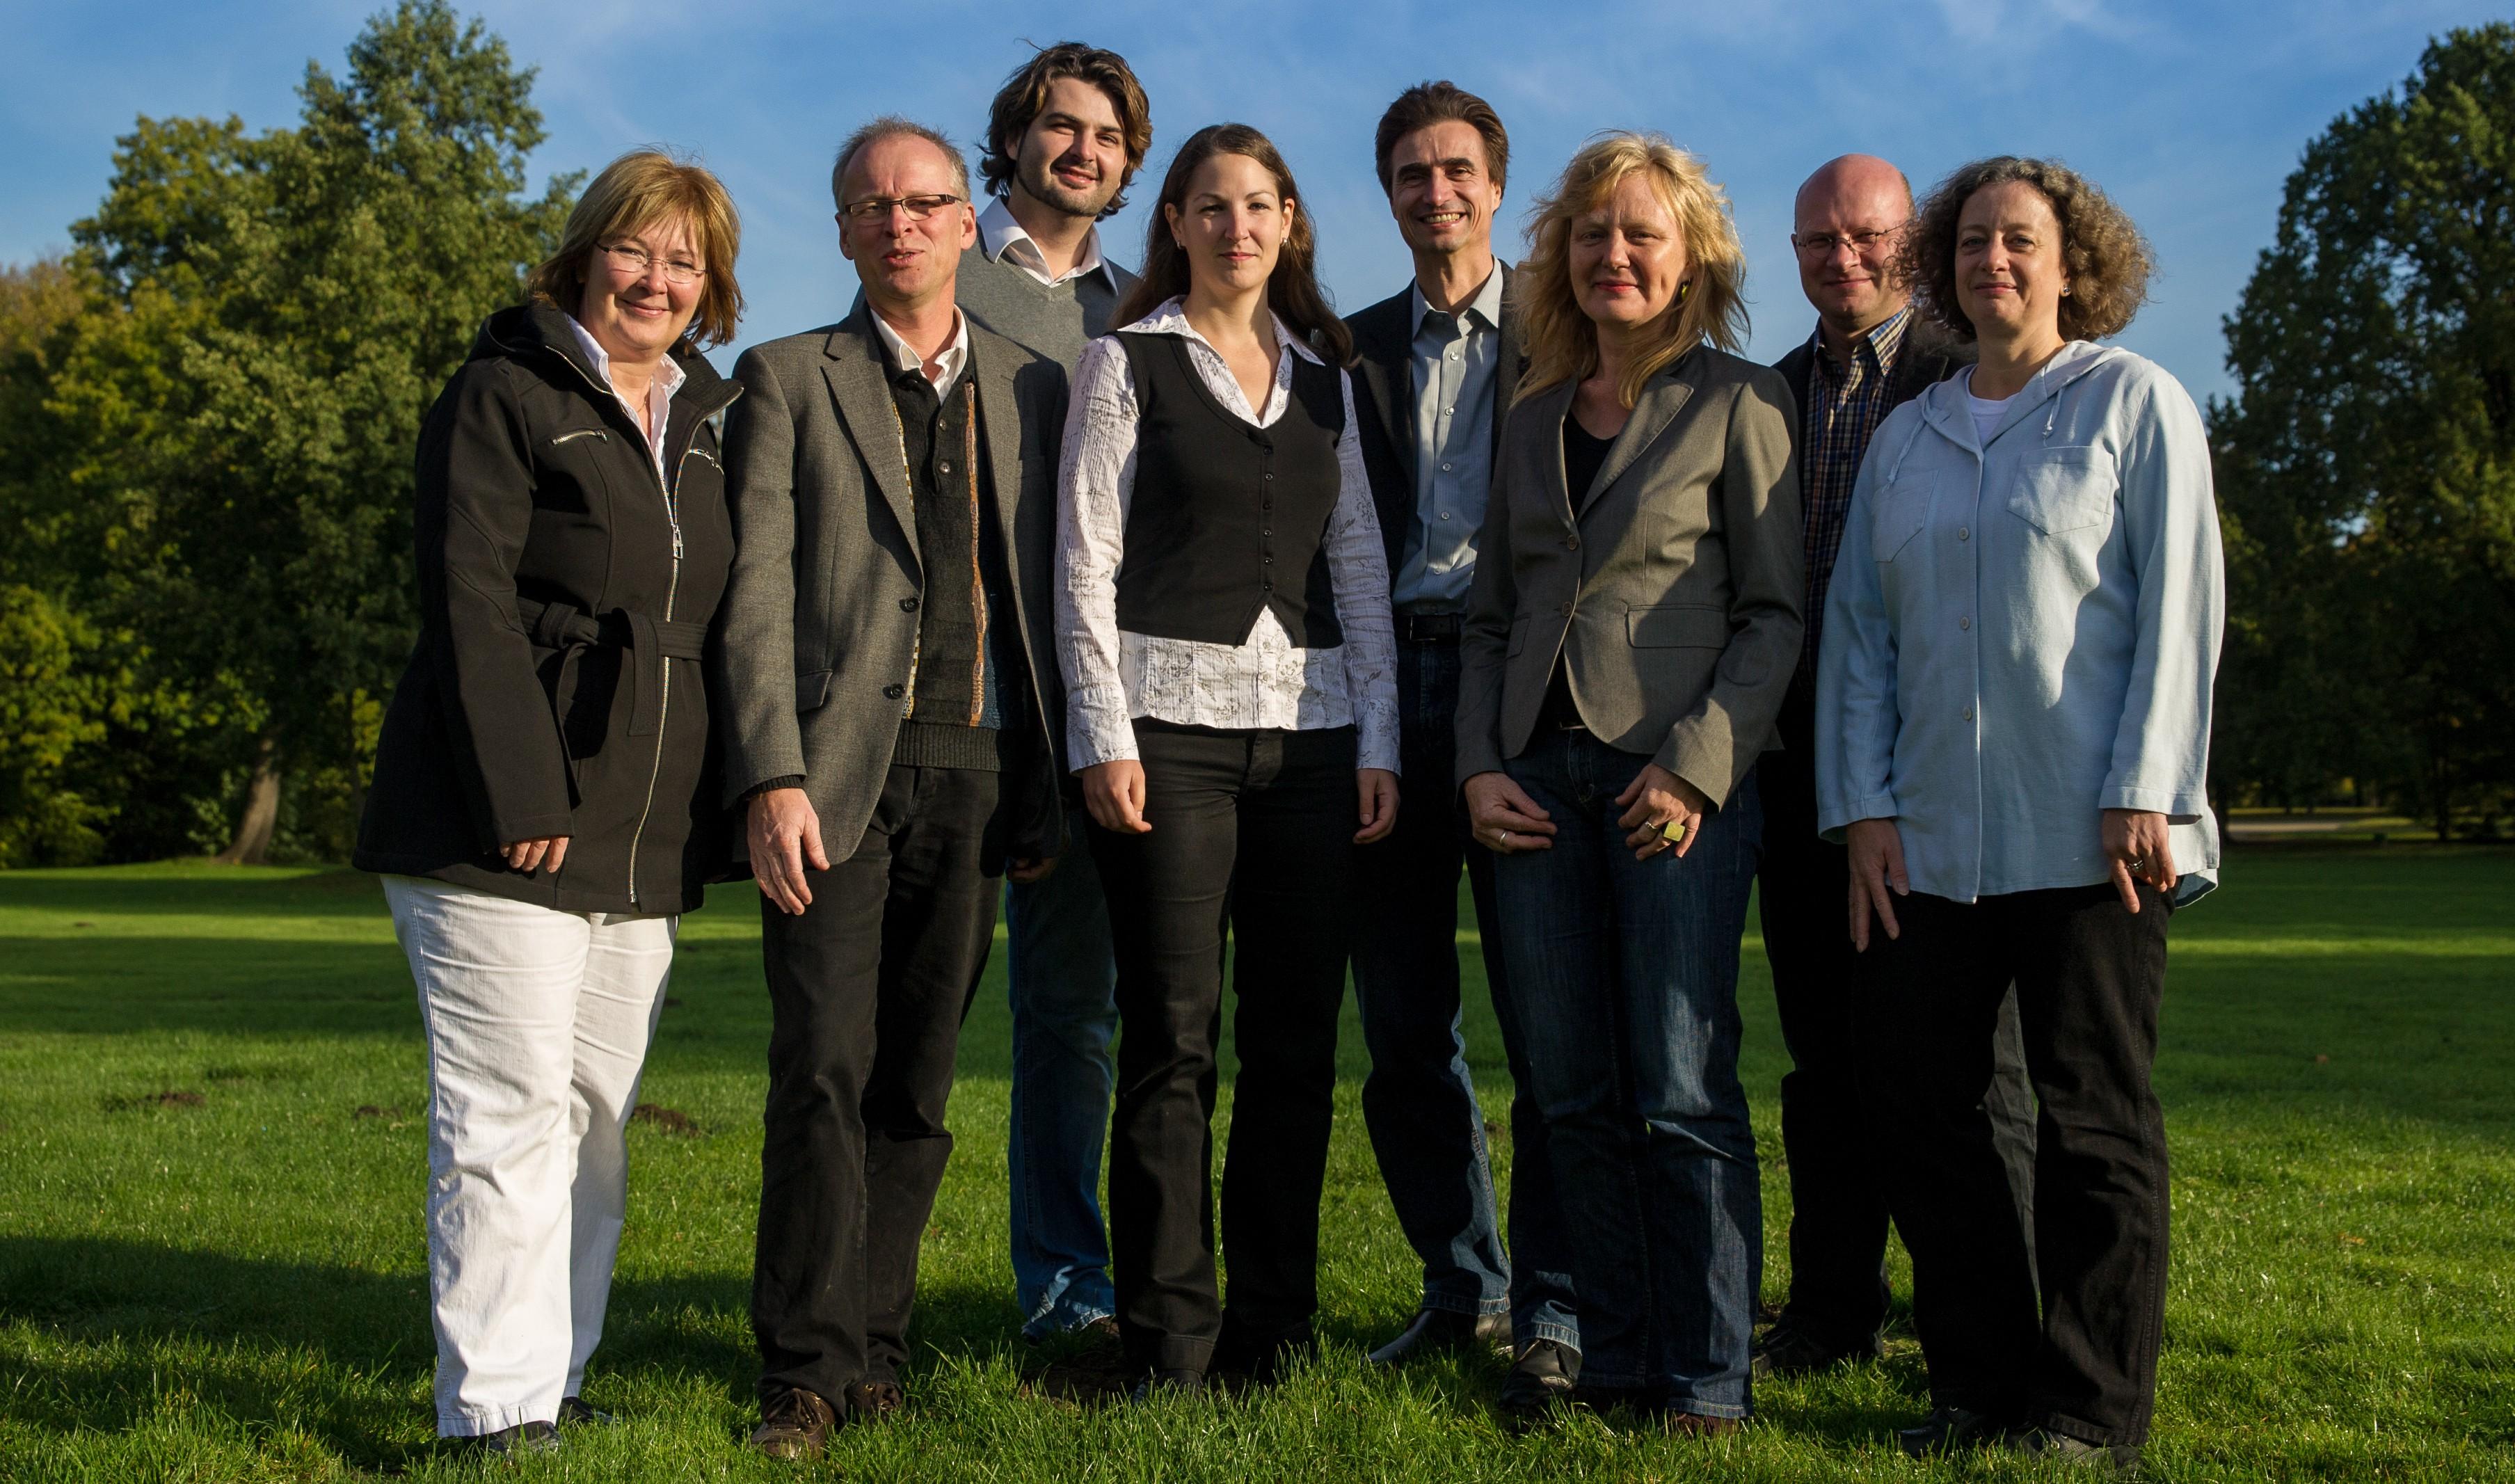 Das Team der Planungsgruppe Umwelt aus Hannover